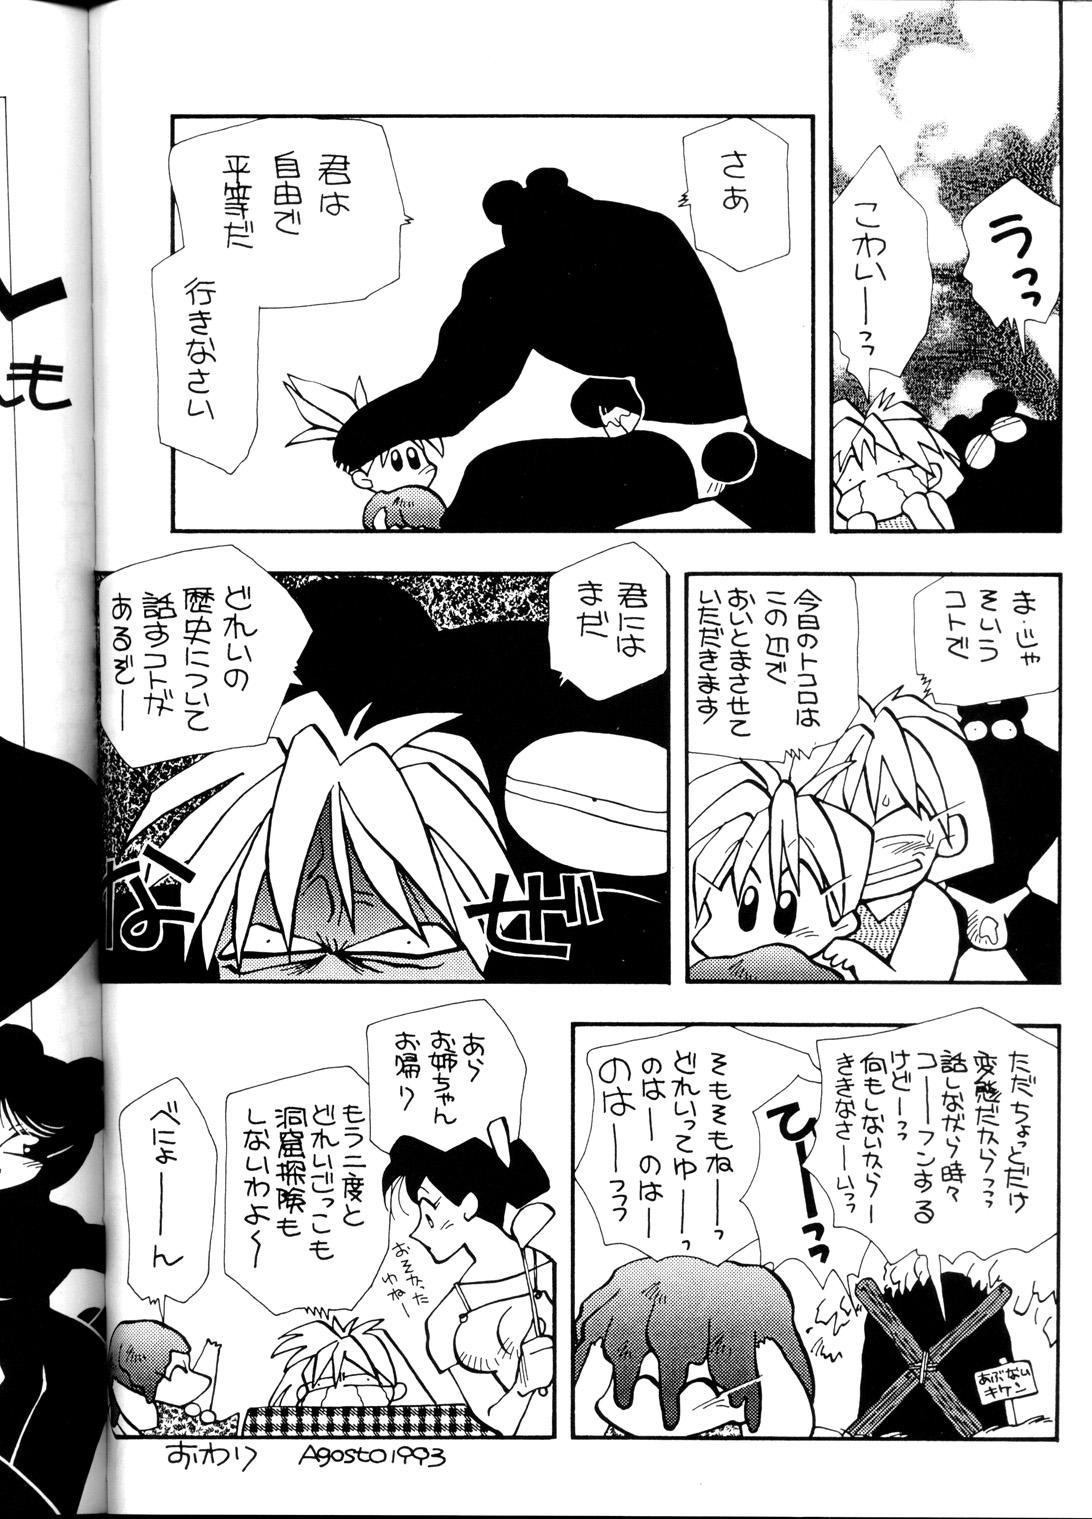 [B.B.C] Tenchi Muyou! Ryou-ou-ki Kaiteiben (Tenchi Muyou!) 62